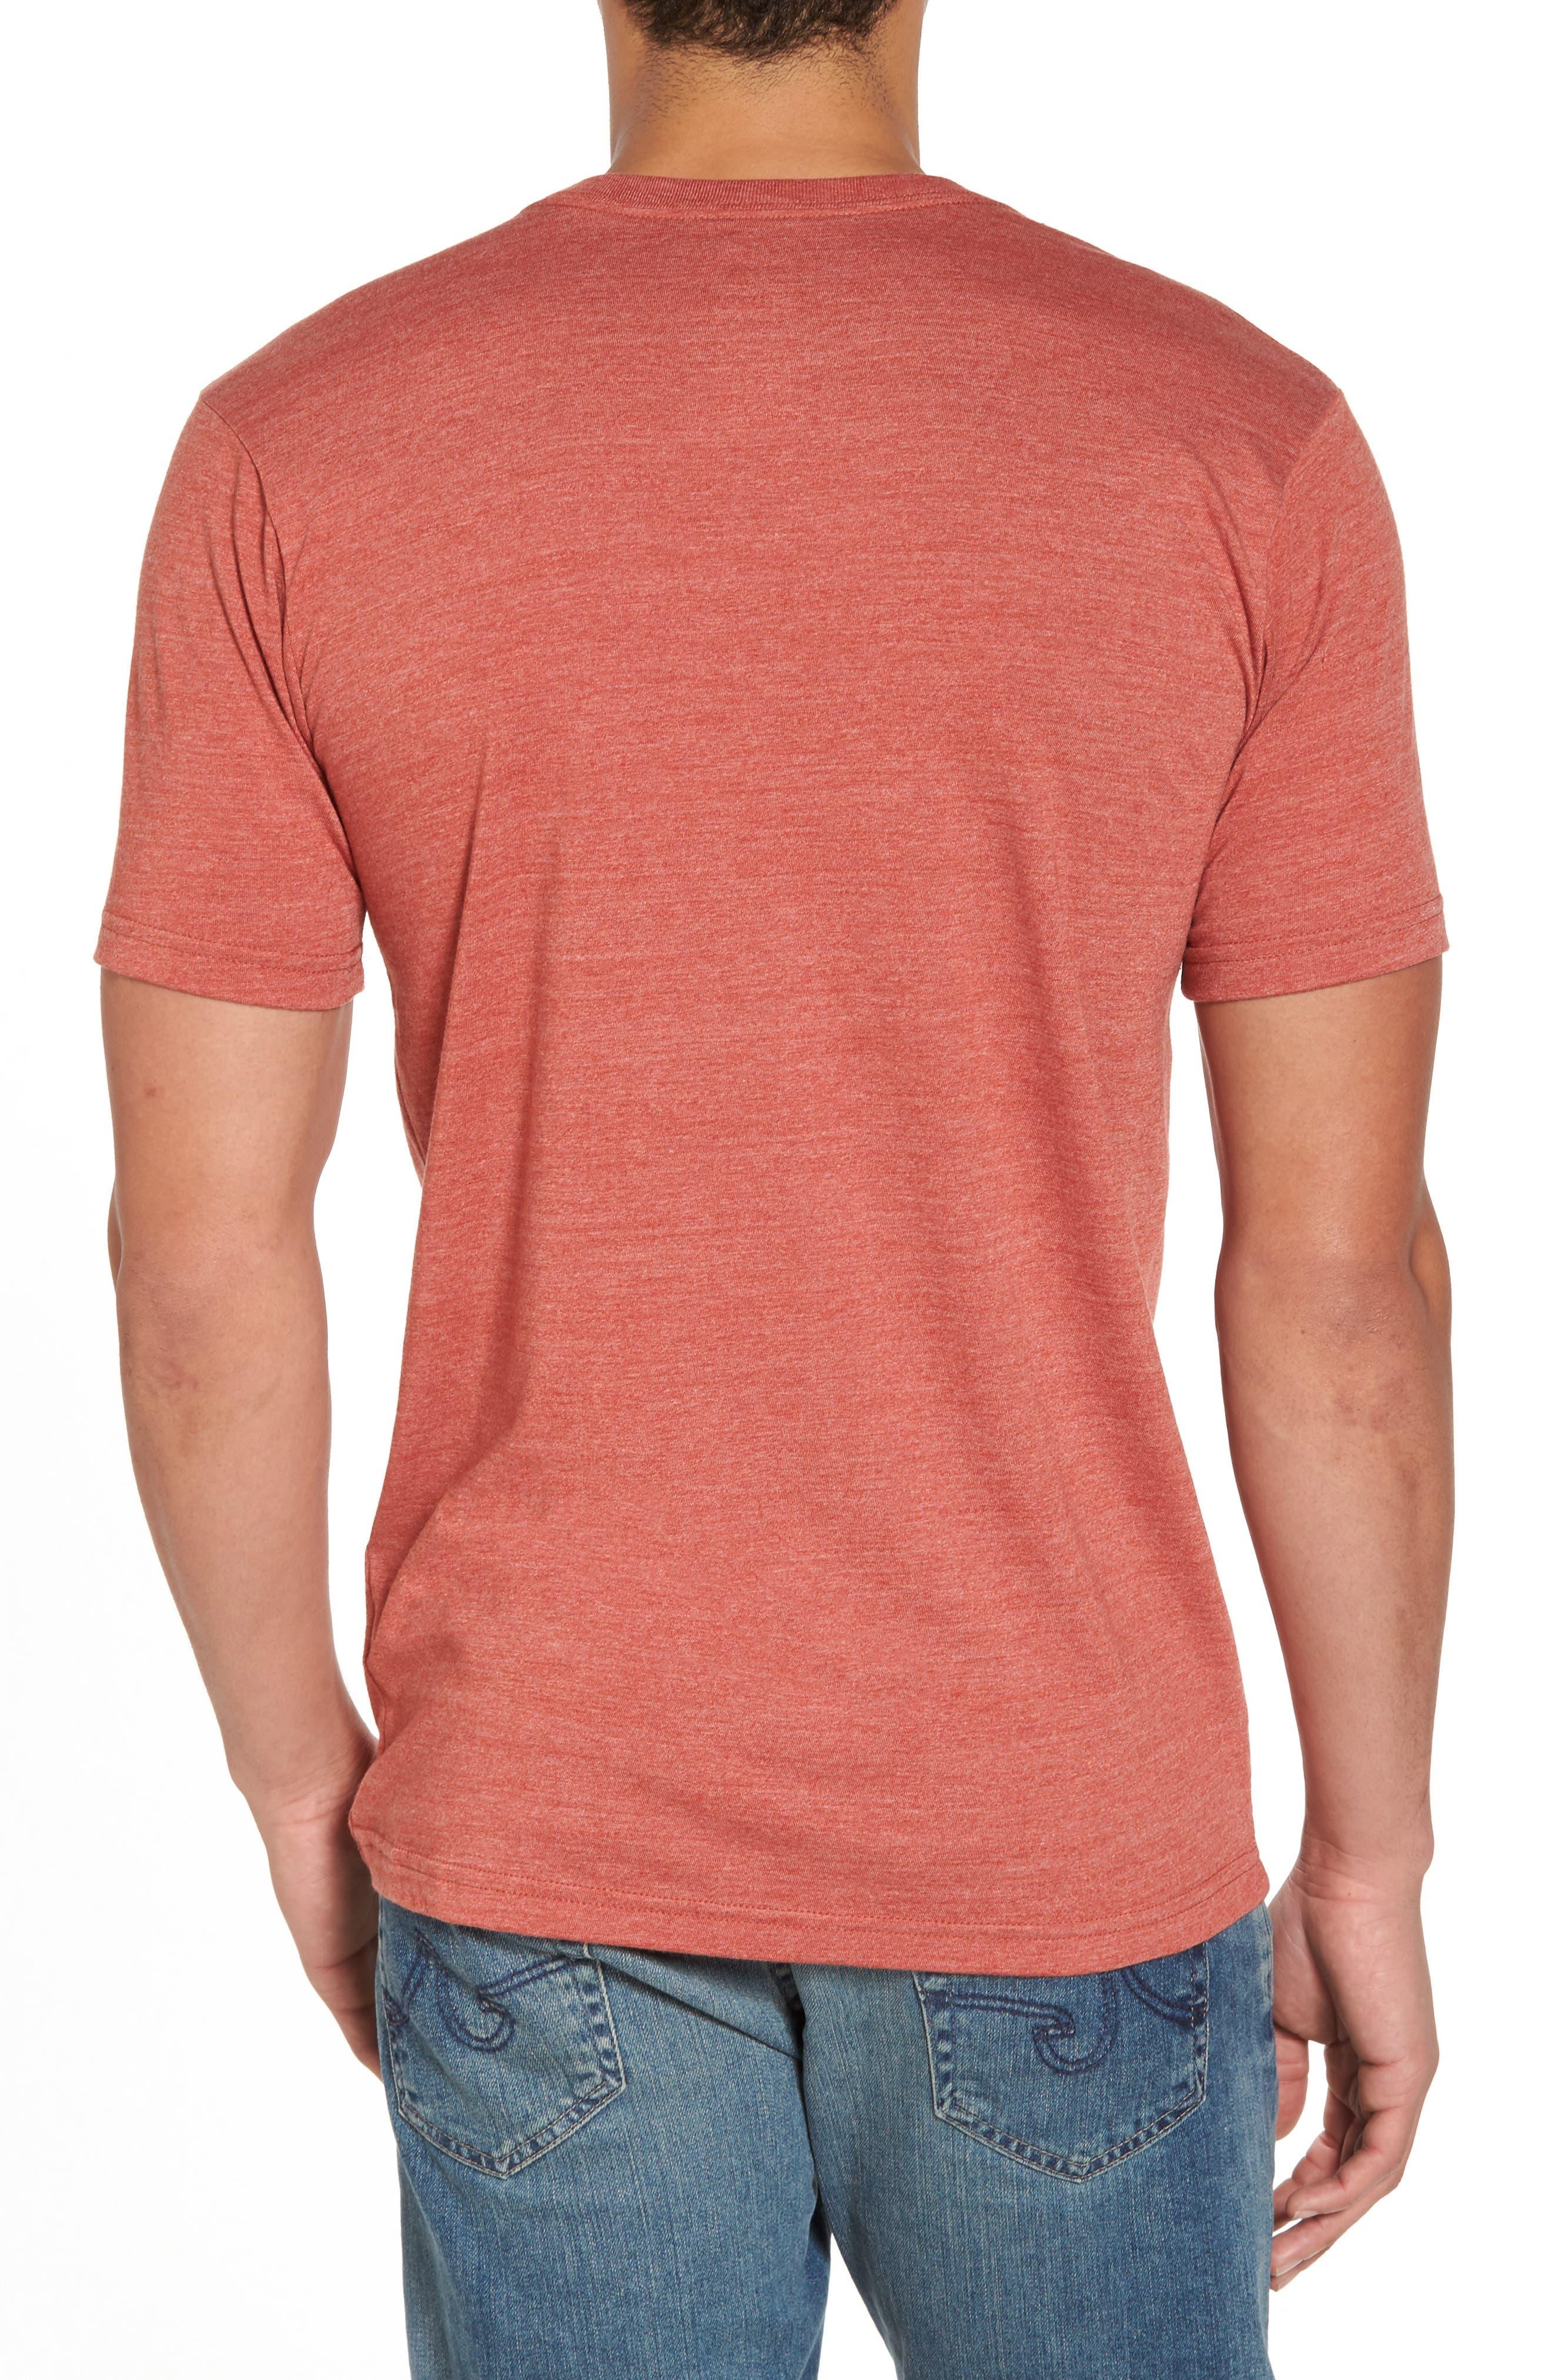 Half Dome T-Shirt,                             Alternate thumbnail 8, color,